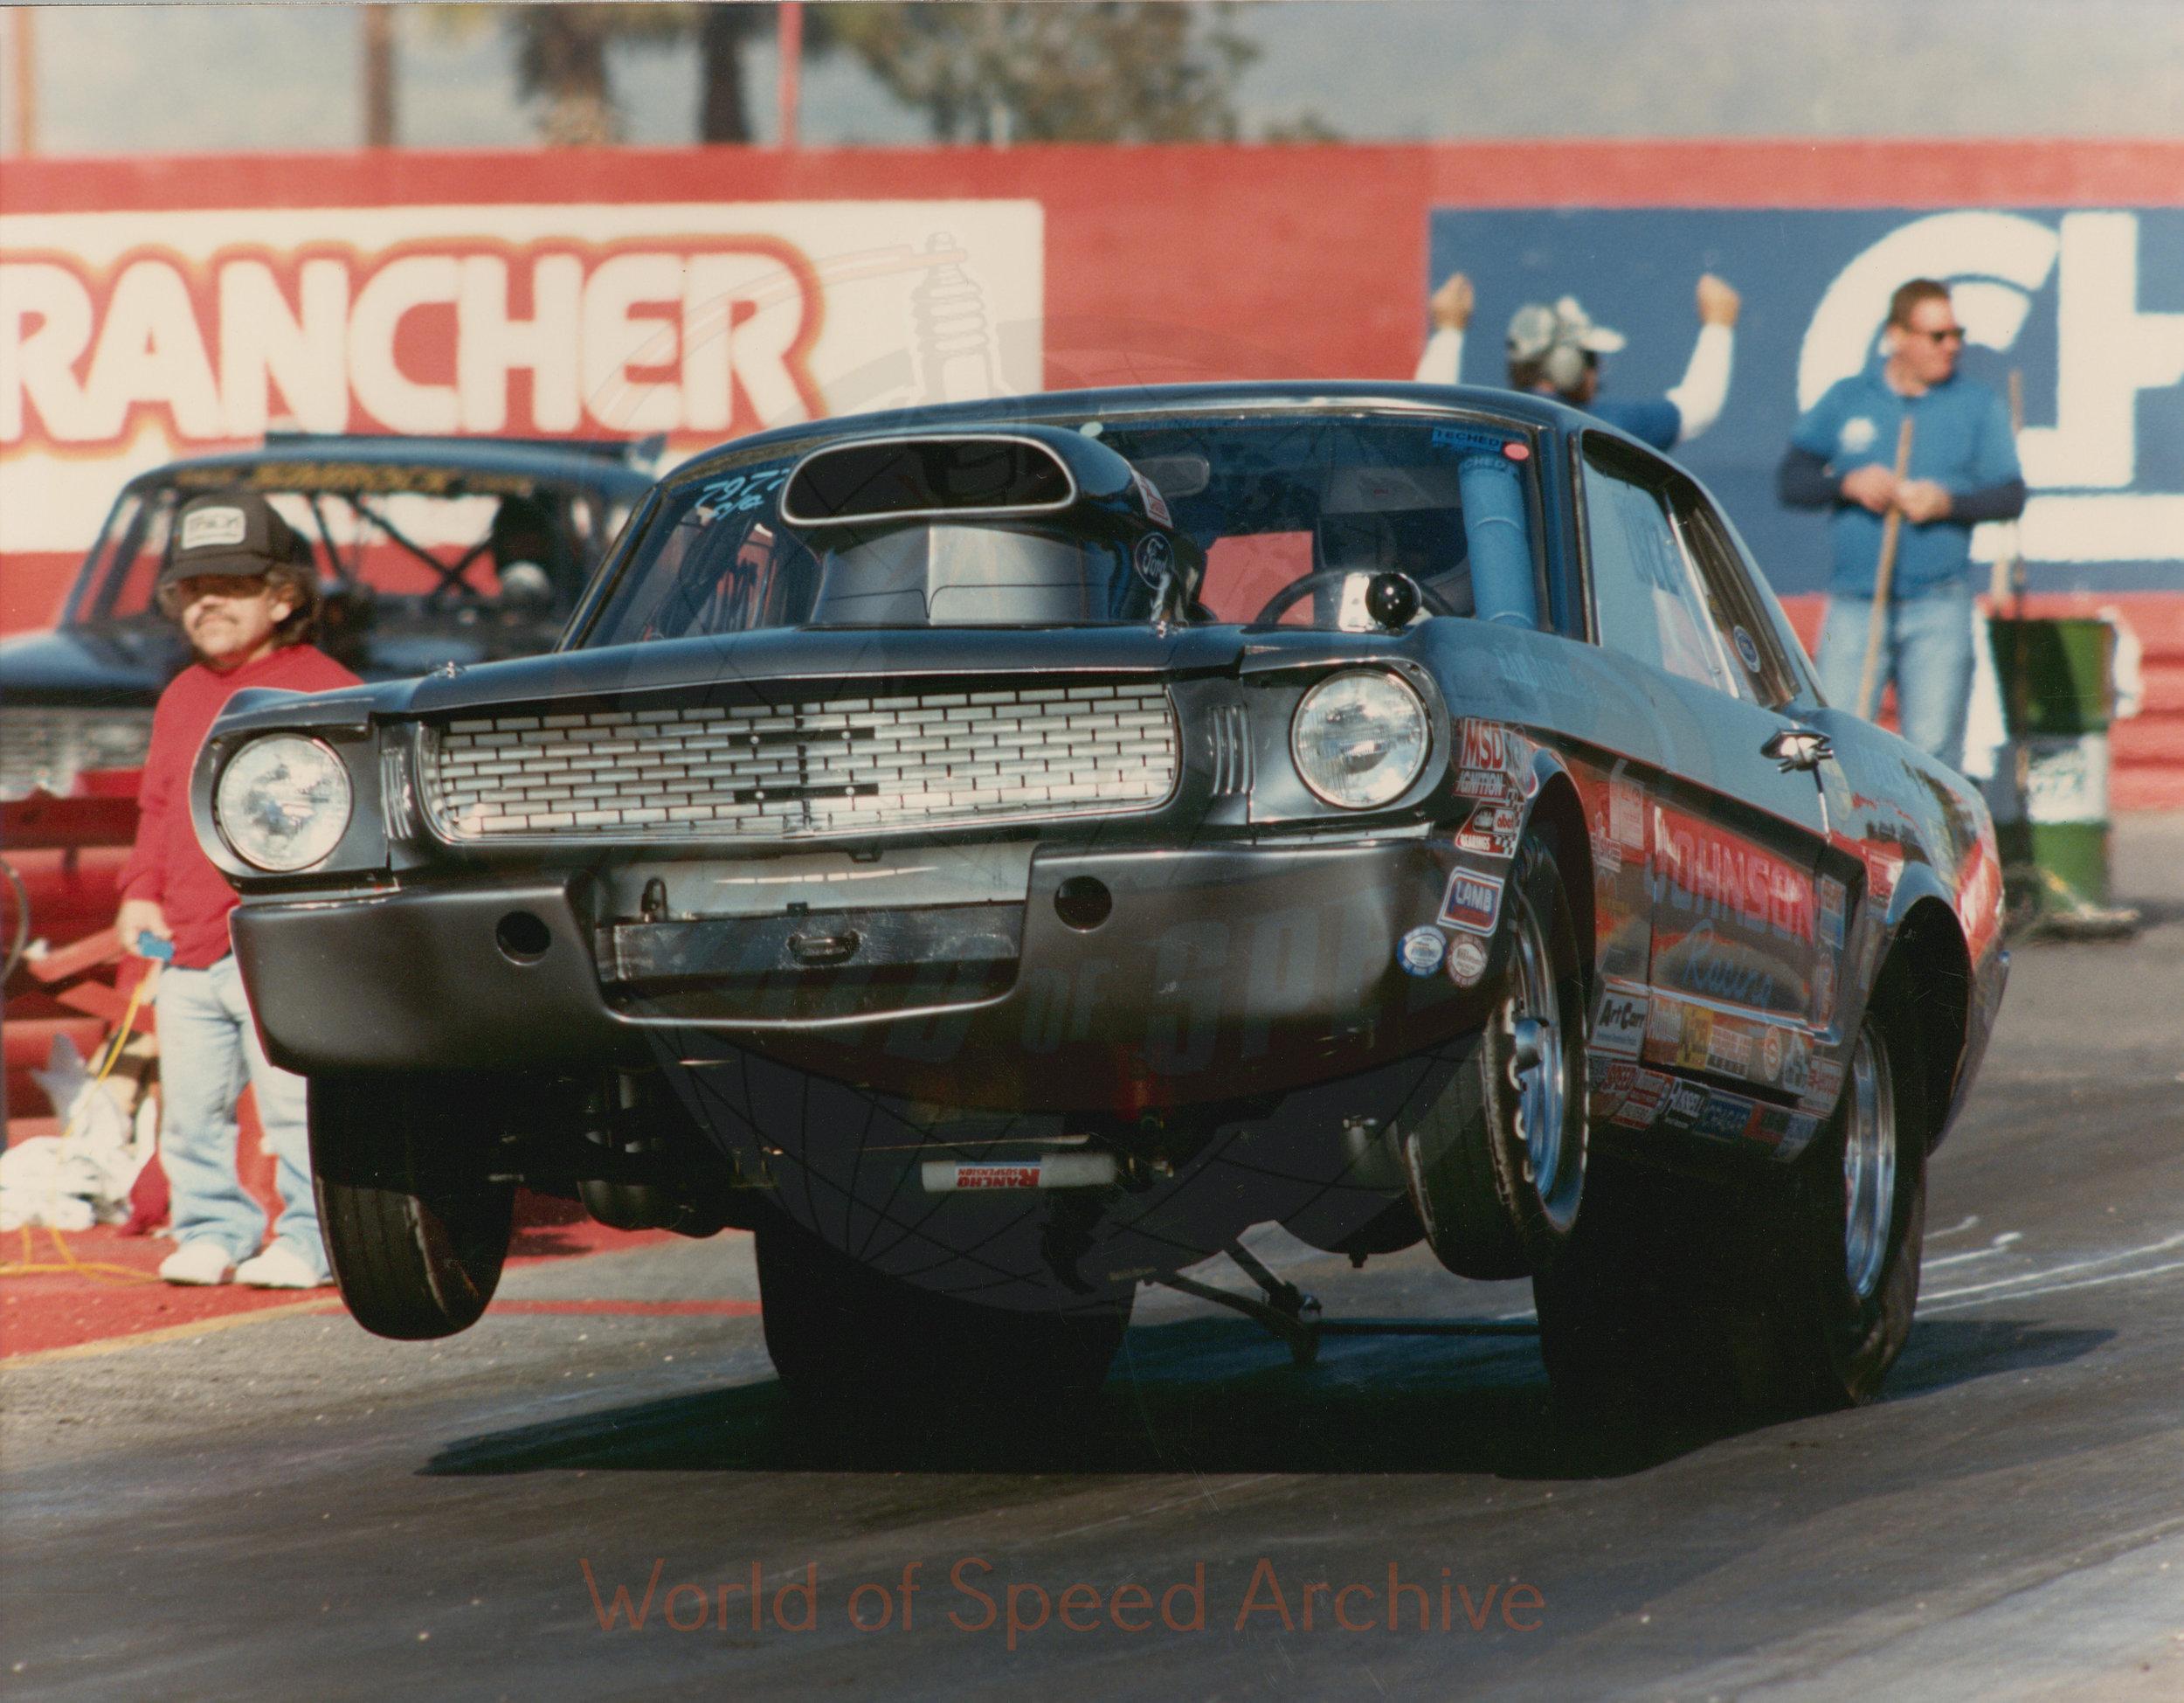 B8-S3-G1-F36-001 - Johnson Racing